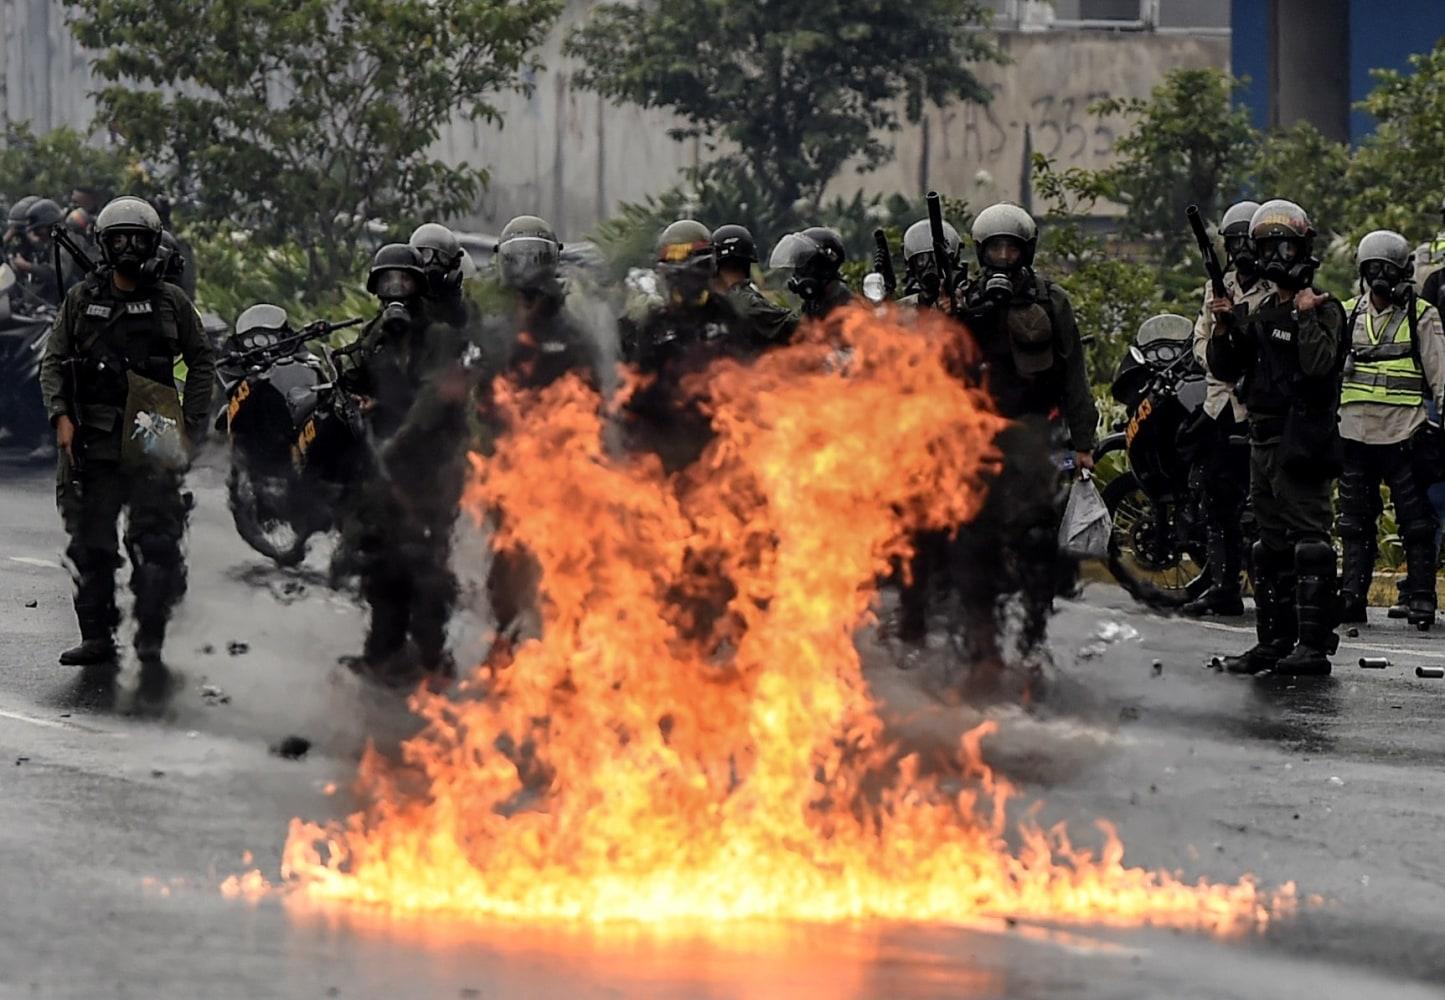 Clash in caracas on april 13 2017 juan barreto afp getty images